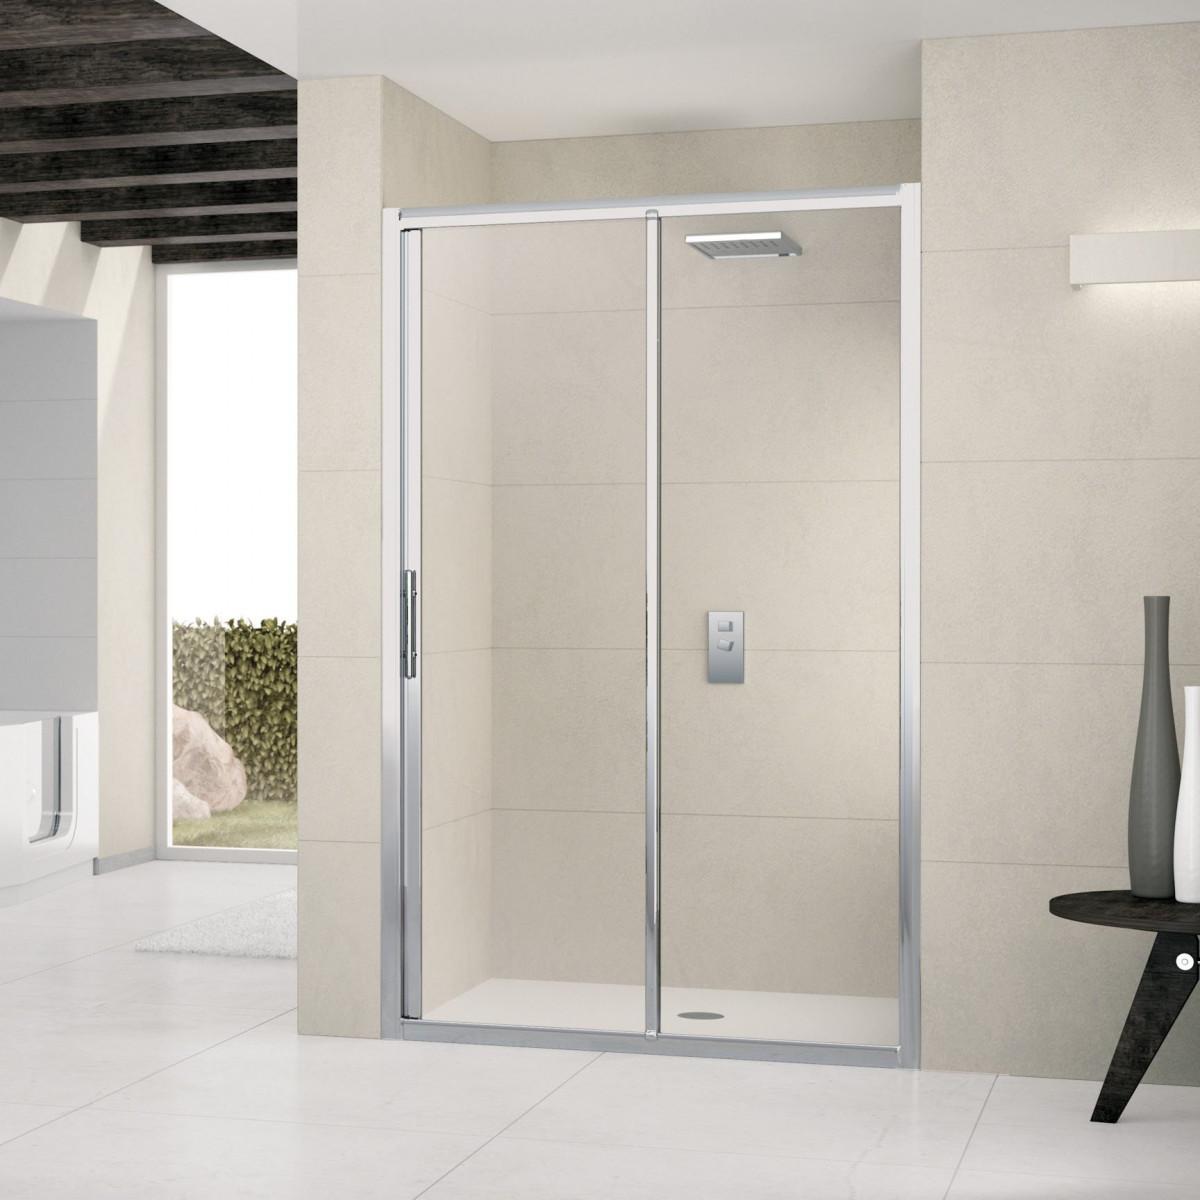 Novellini lunes 1500 2p sliding shower door lunes2p144 for 1500 sliding shower door